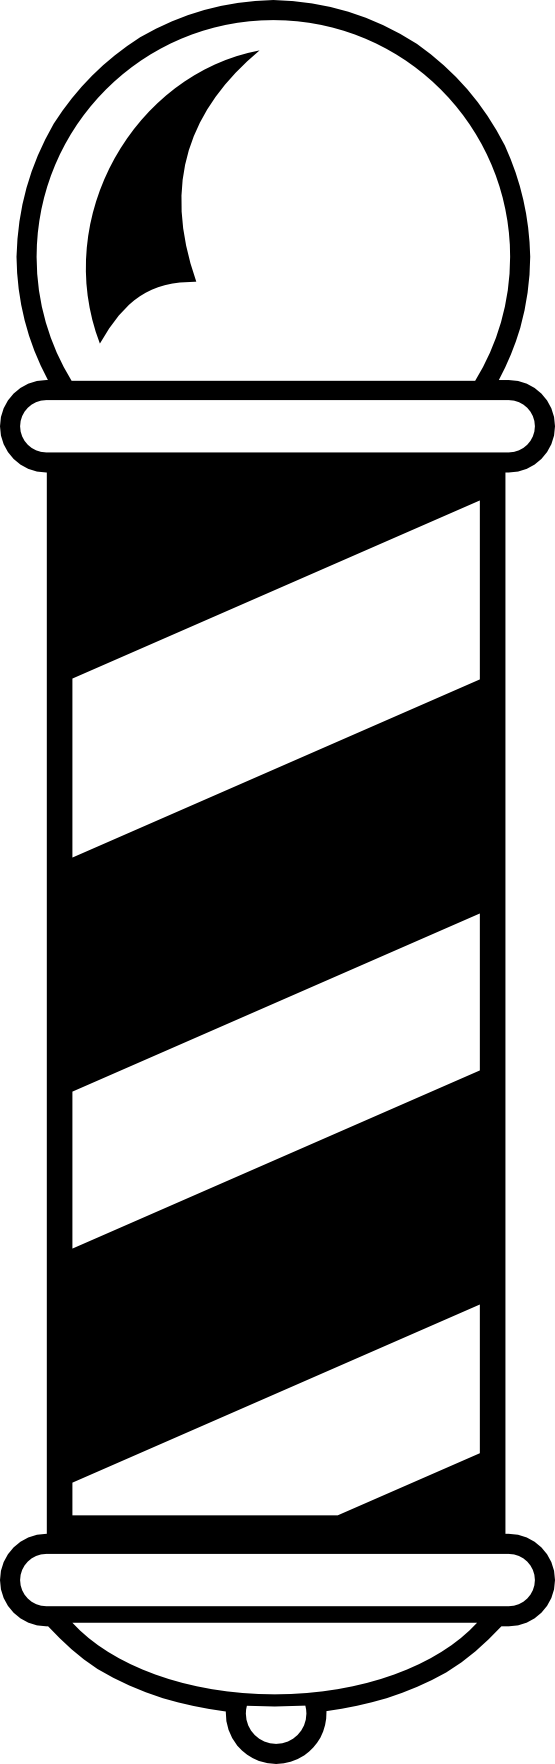 Barber Shop Pole Logo - ClipArt Best